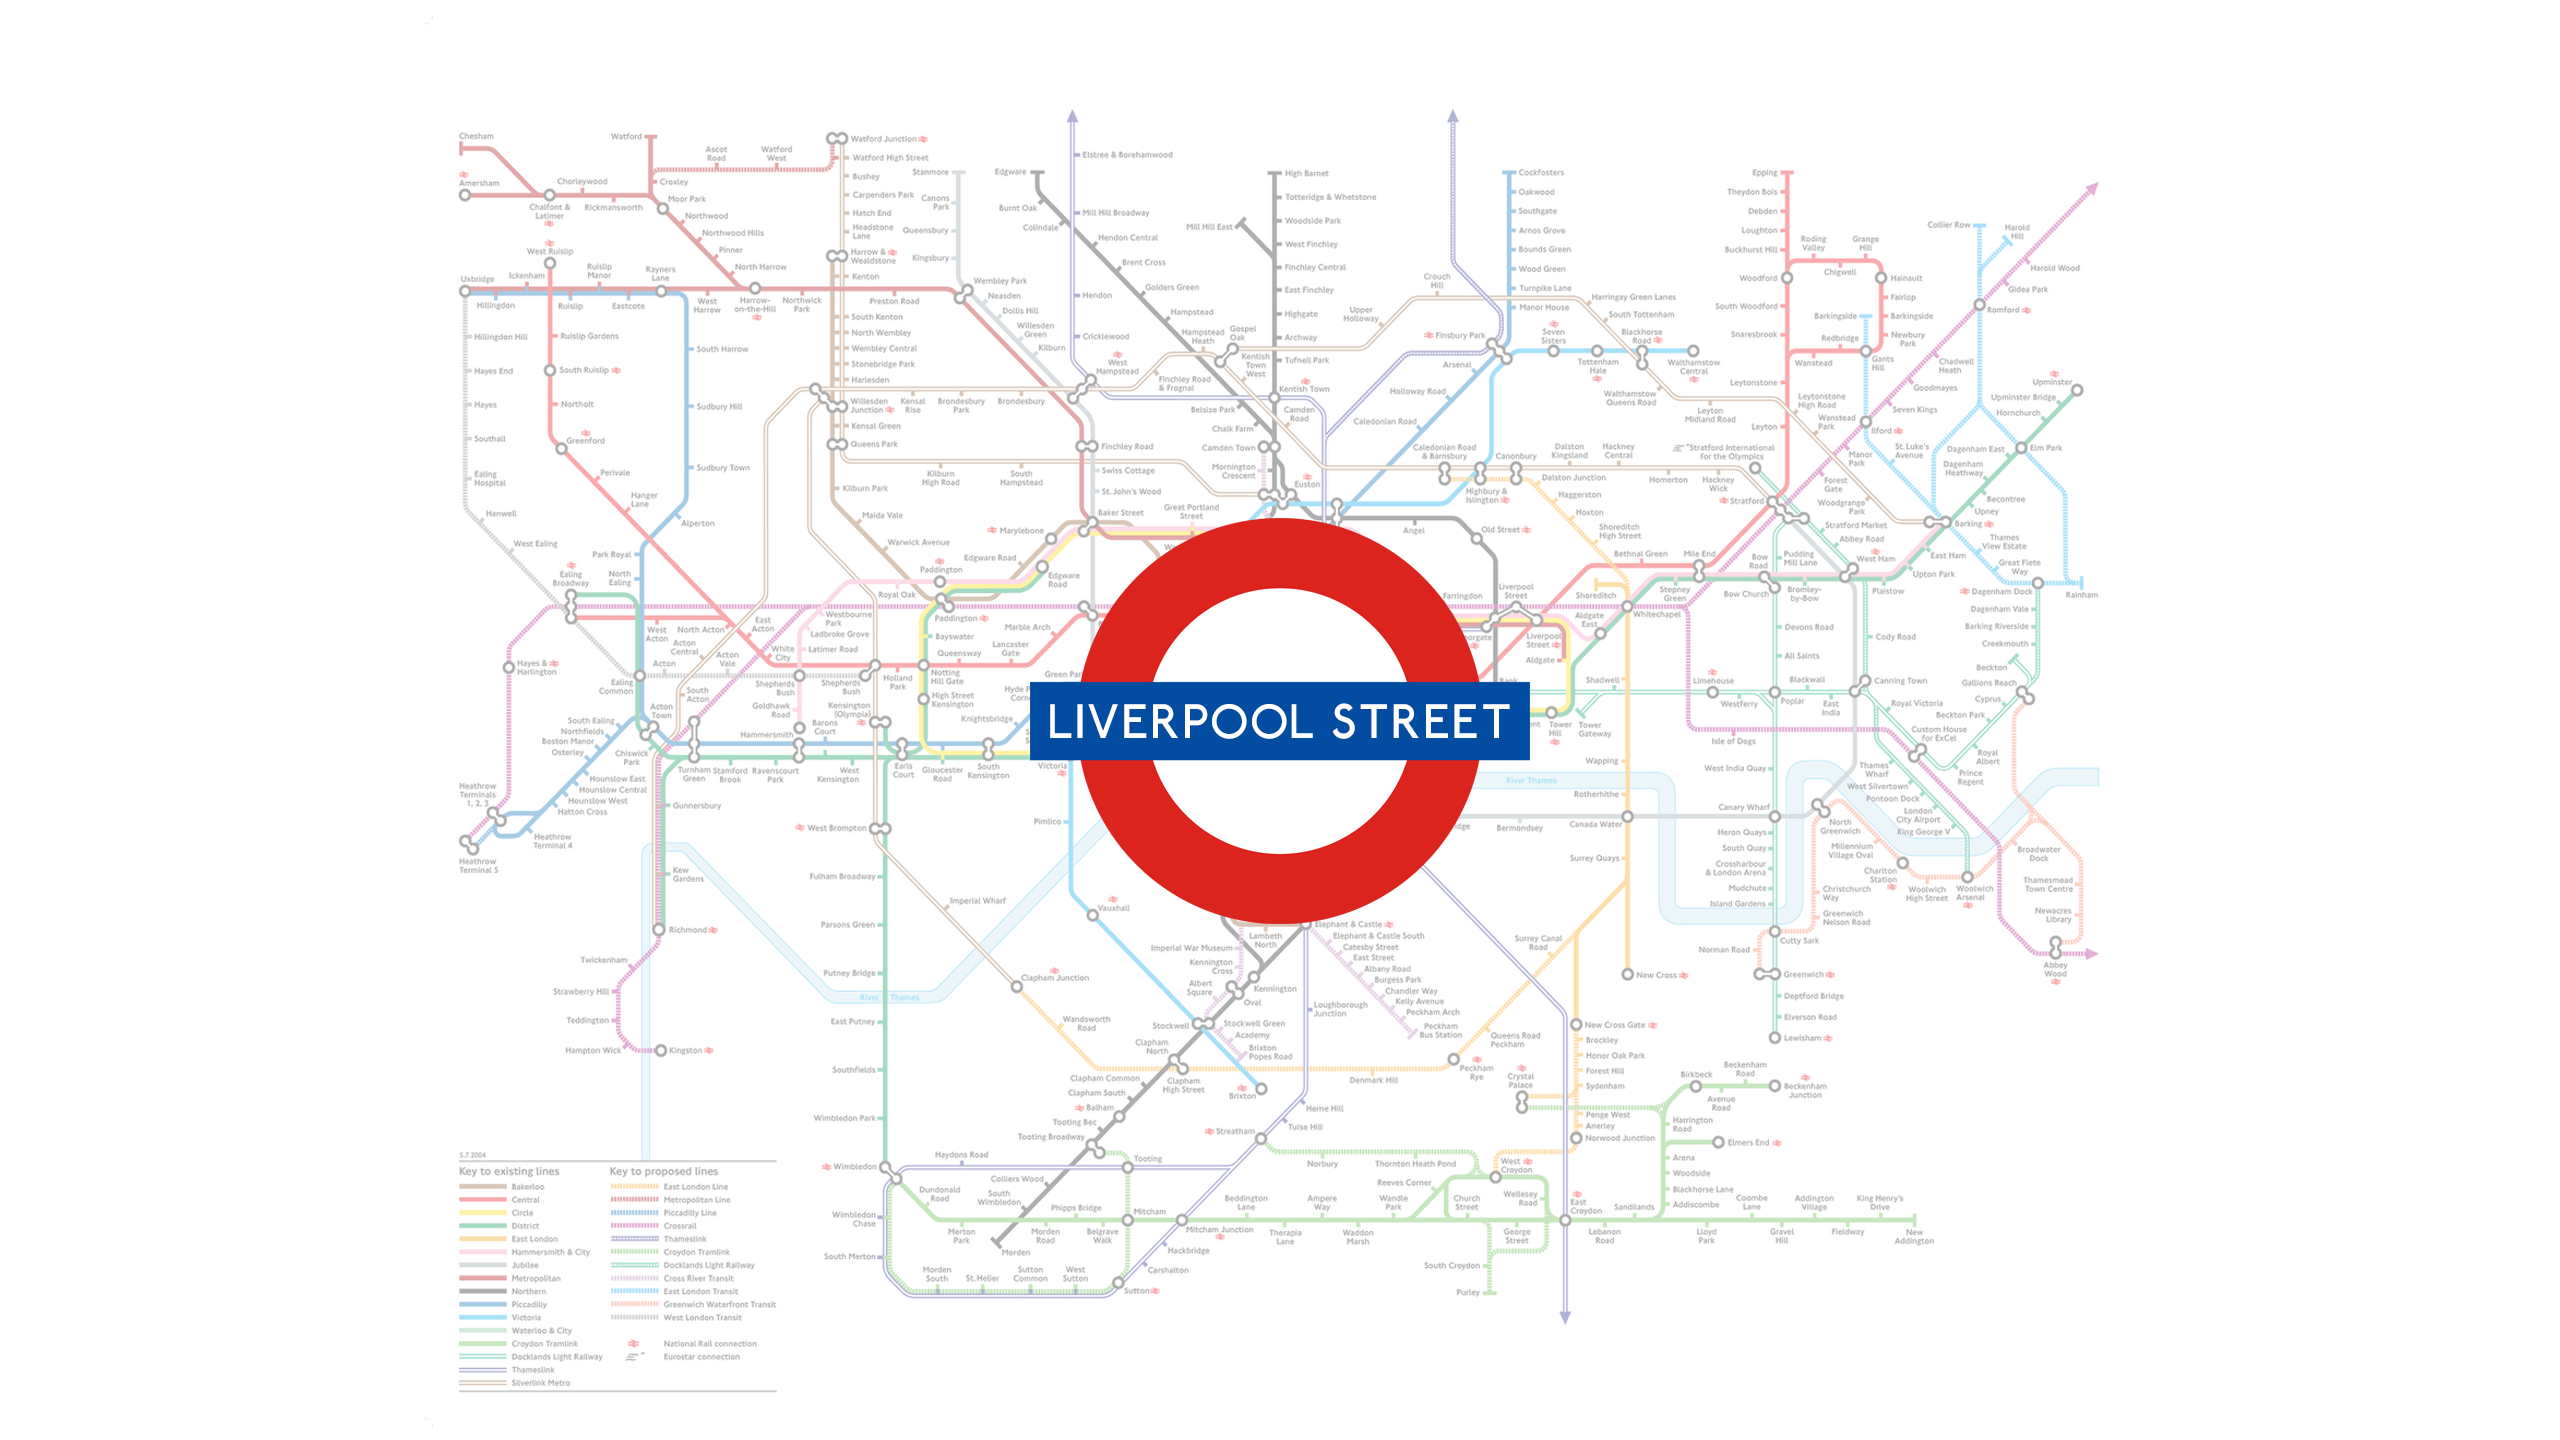 Liverpool Street (Map)